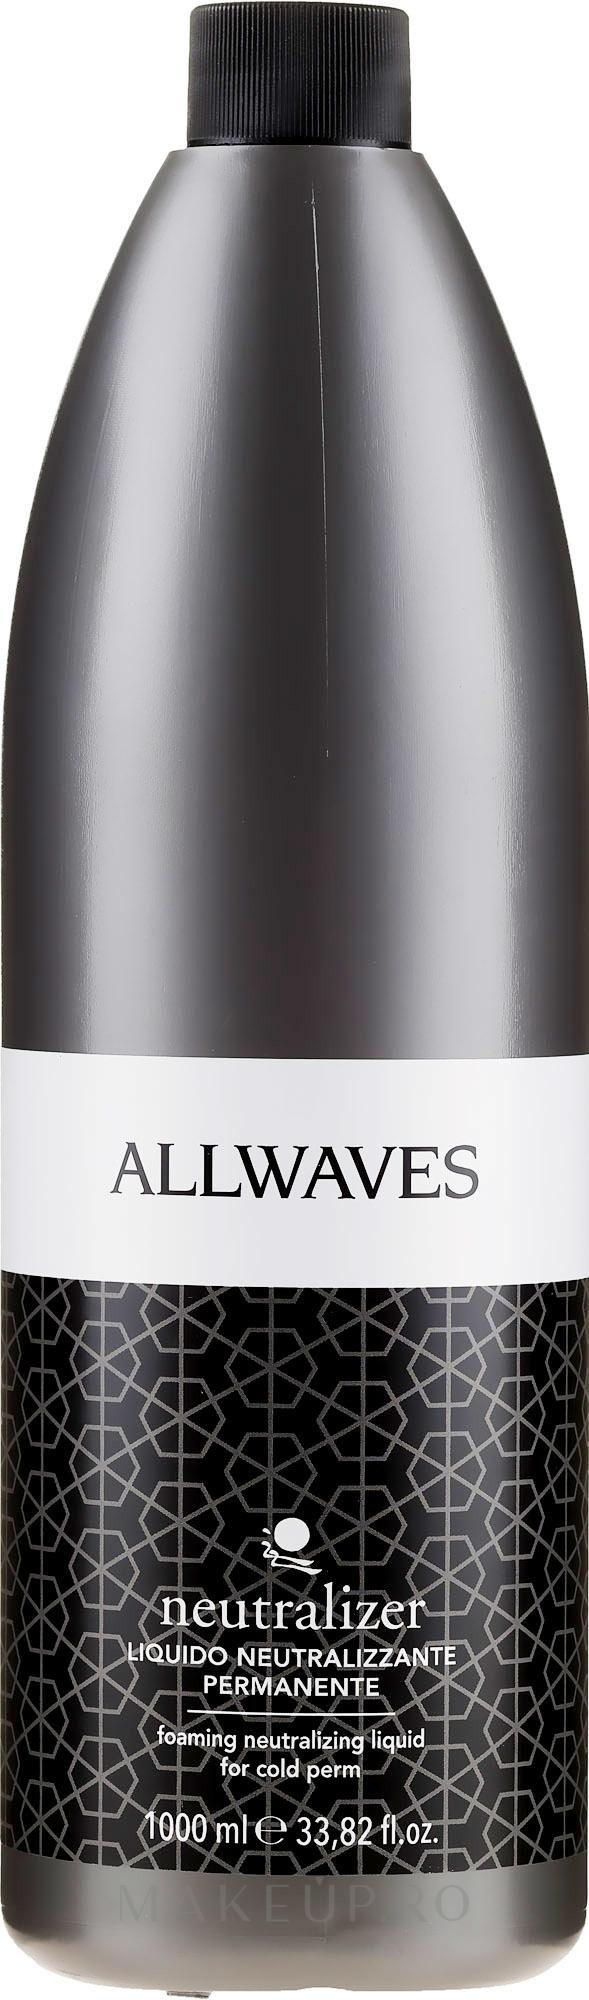 Neutralizator de păr - Allwaves Neutralizer — Imagine 1000 ml